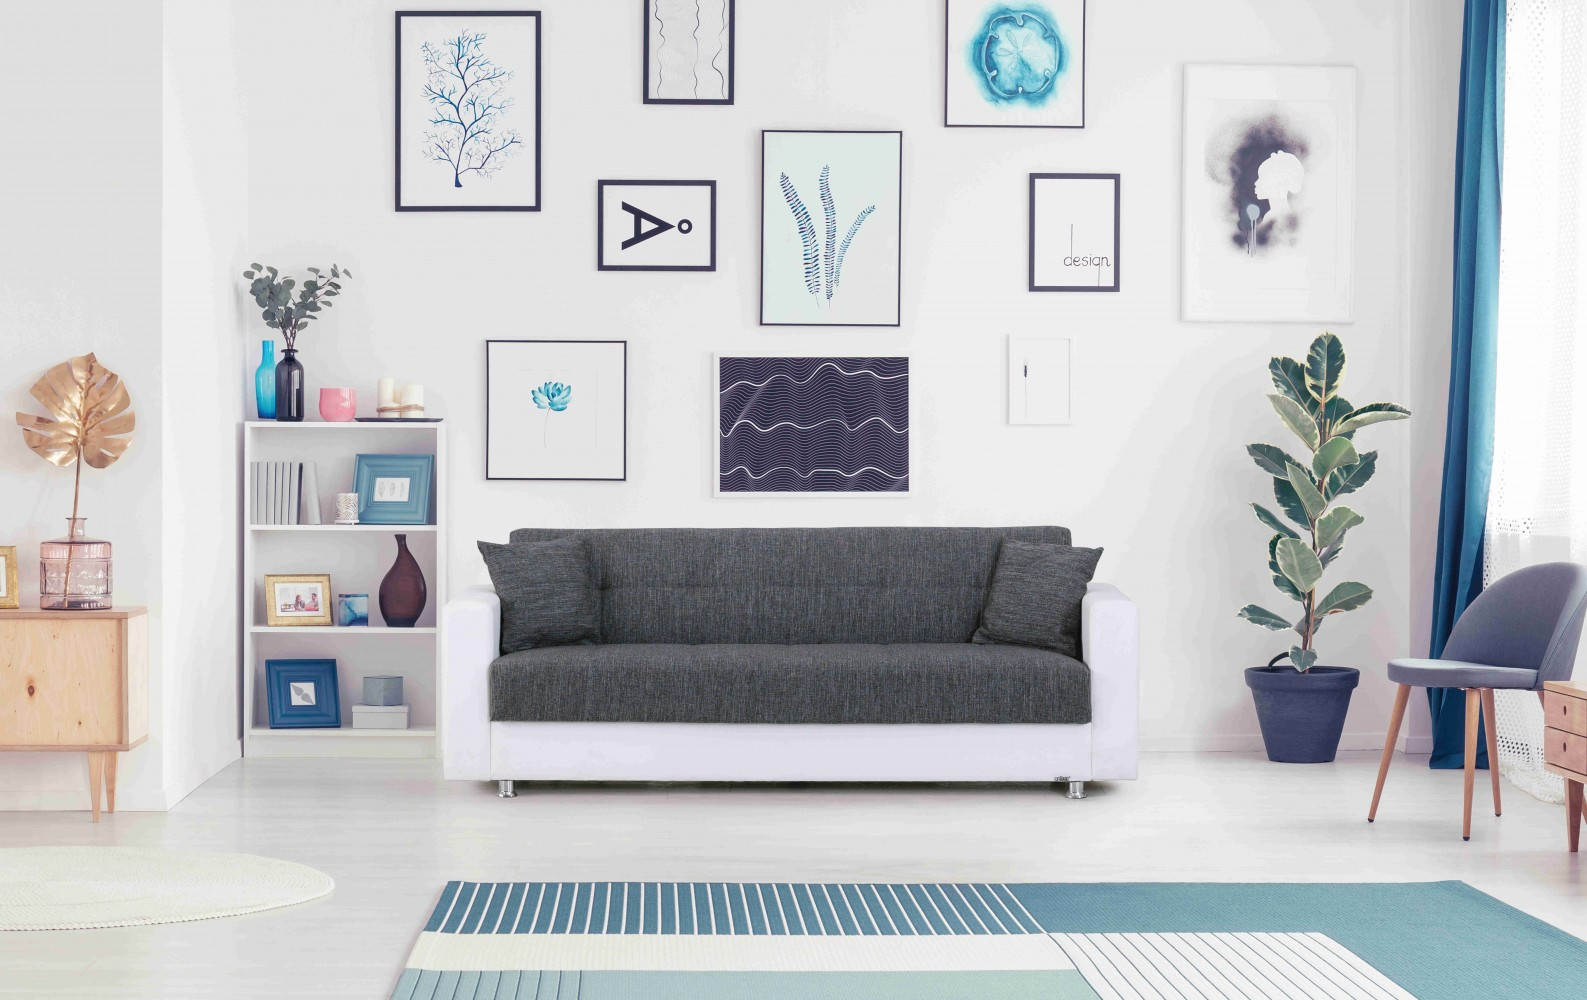 modernes funktionssofa kippsofa schlafsofa sofa schlafcouch bettsofa couch wei ebay. Black Bedroom Furniture Sets. Home Design Ideas